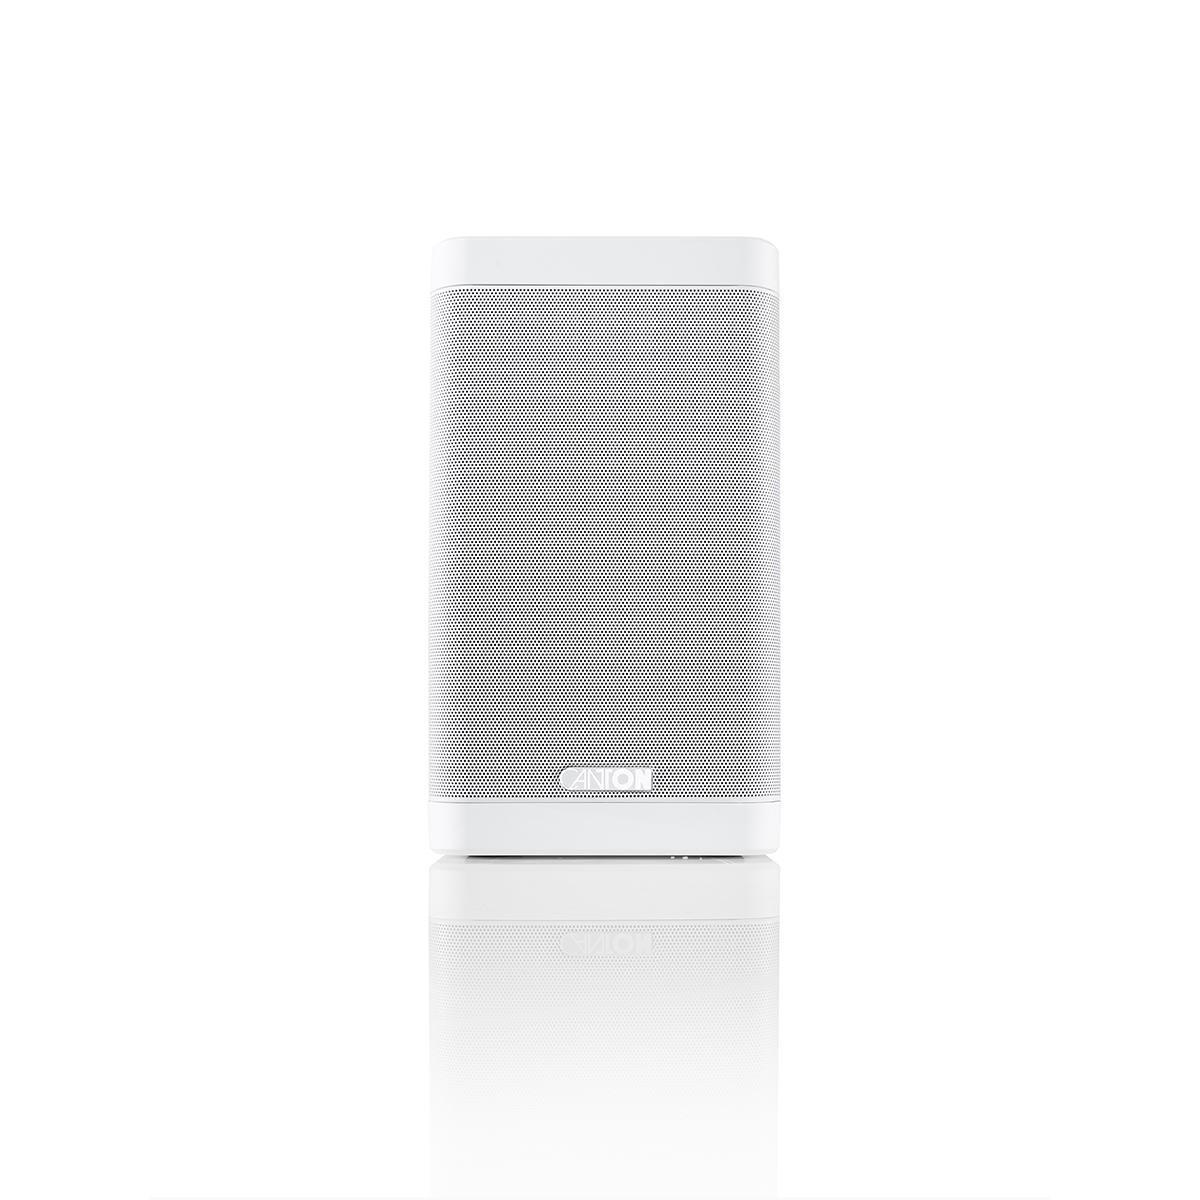 Głośnik multiroom SMART SOUNDBOX 3